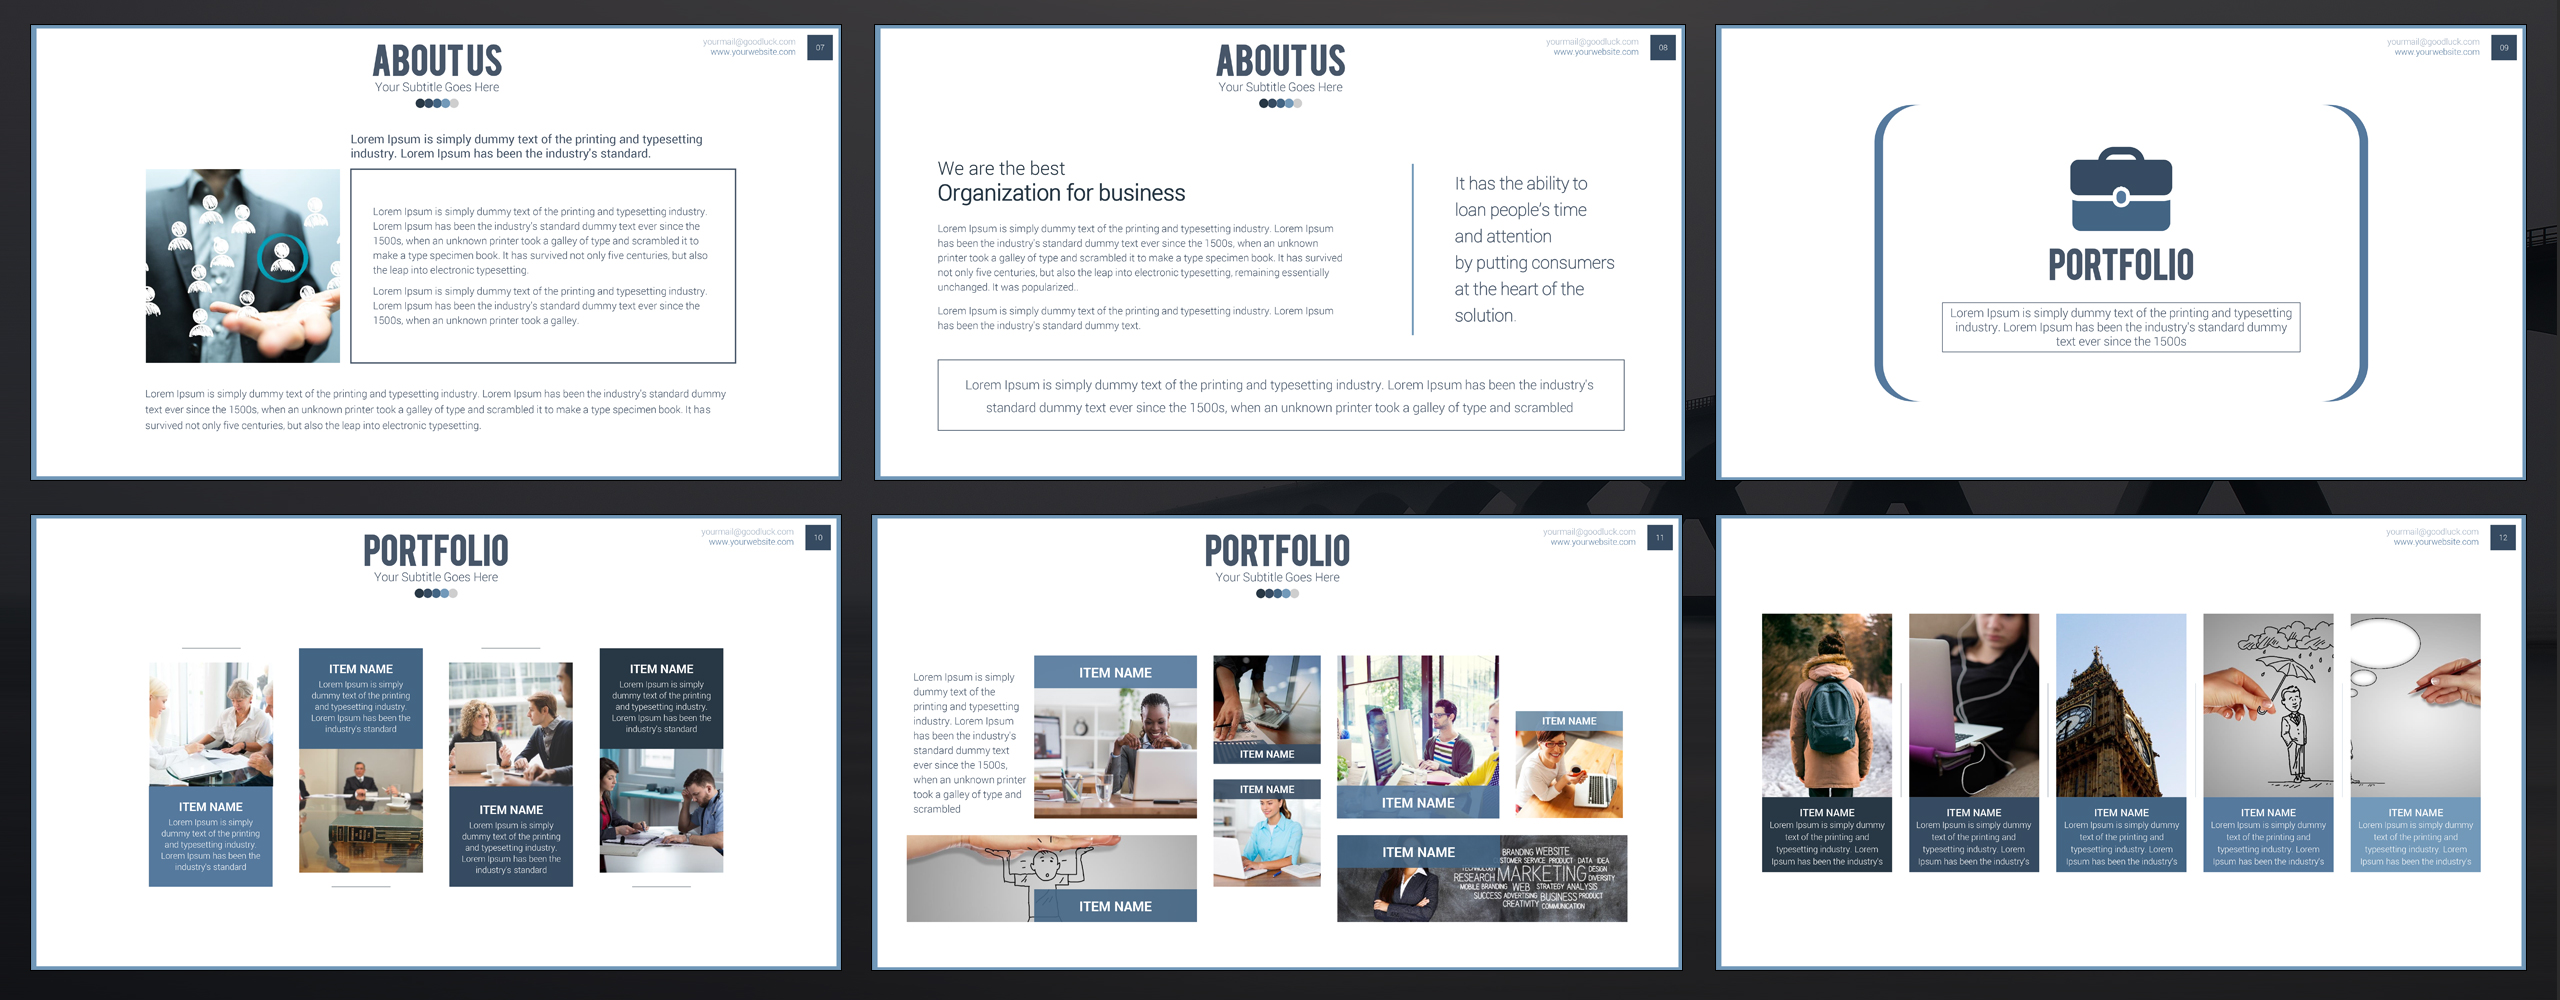 Noksa - PowerPoint Presentation Template Big Screenshot